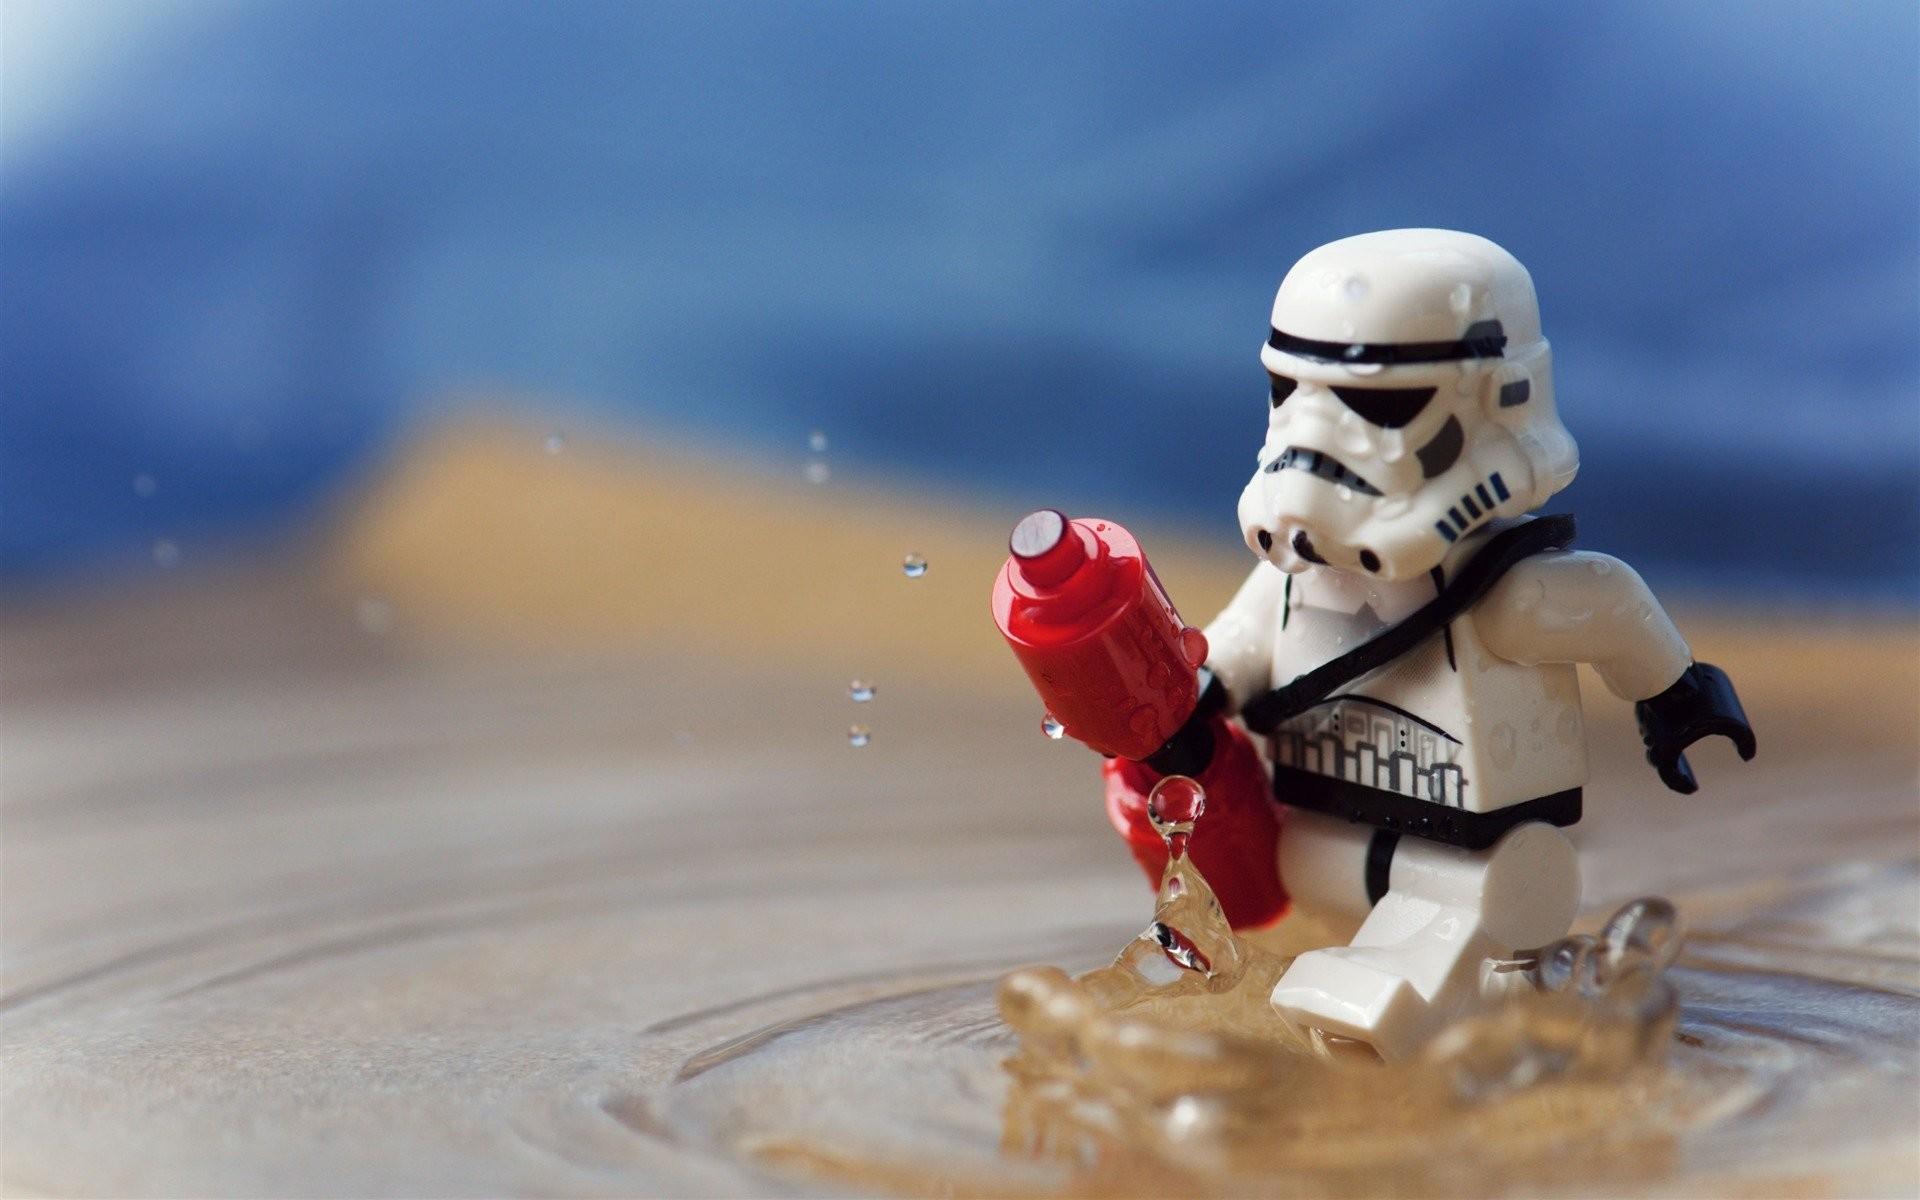 Lego Stormtrooper 510526